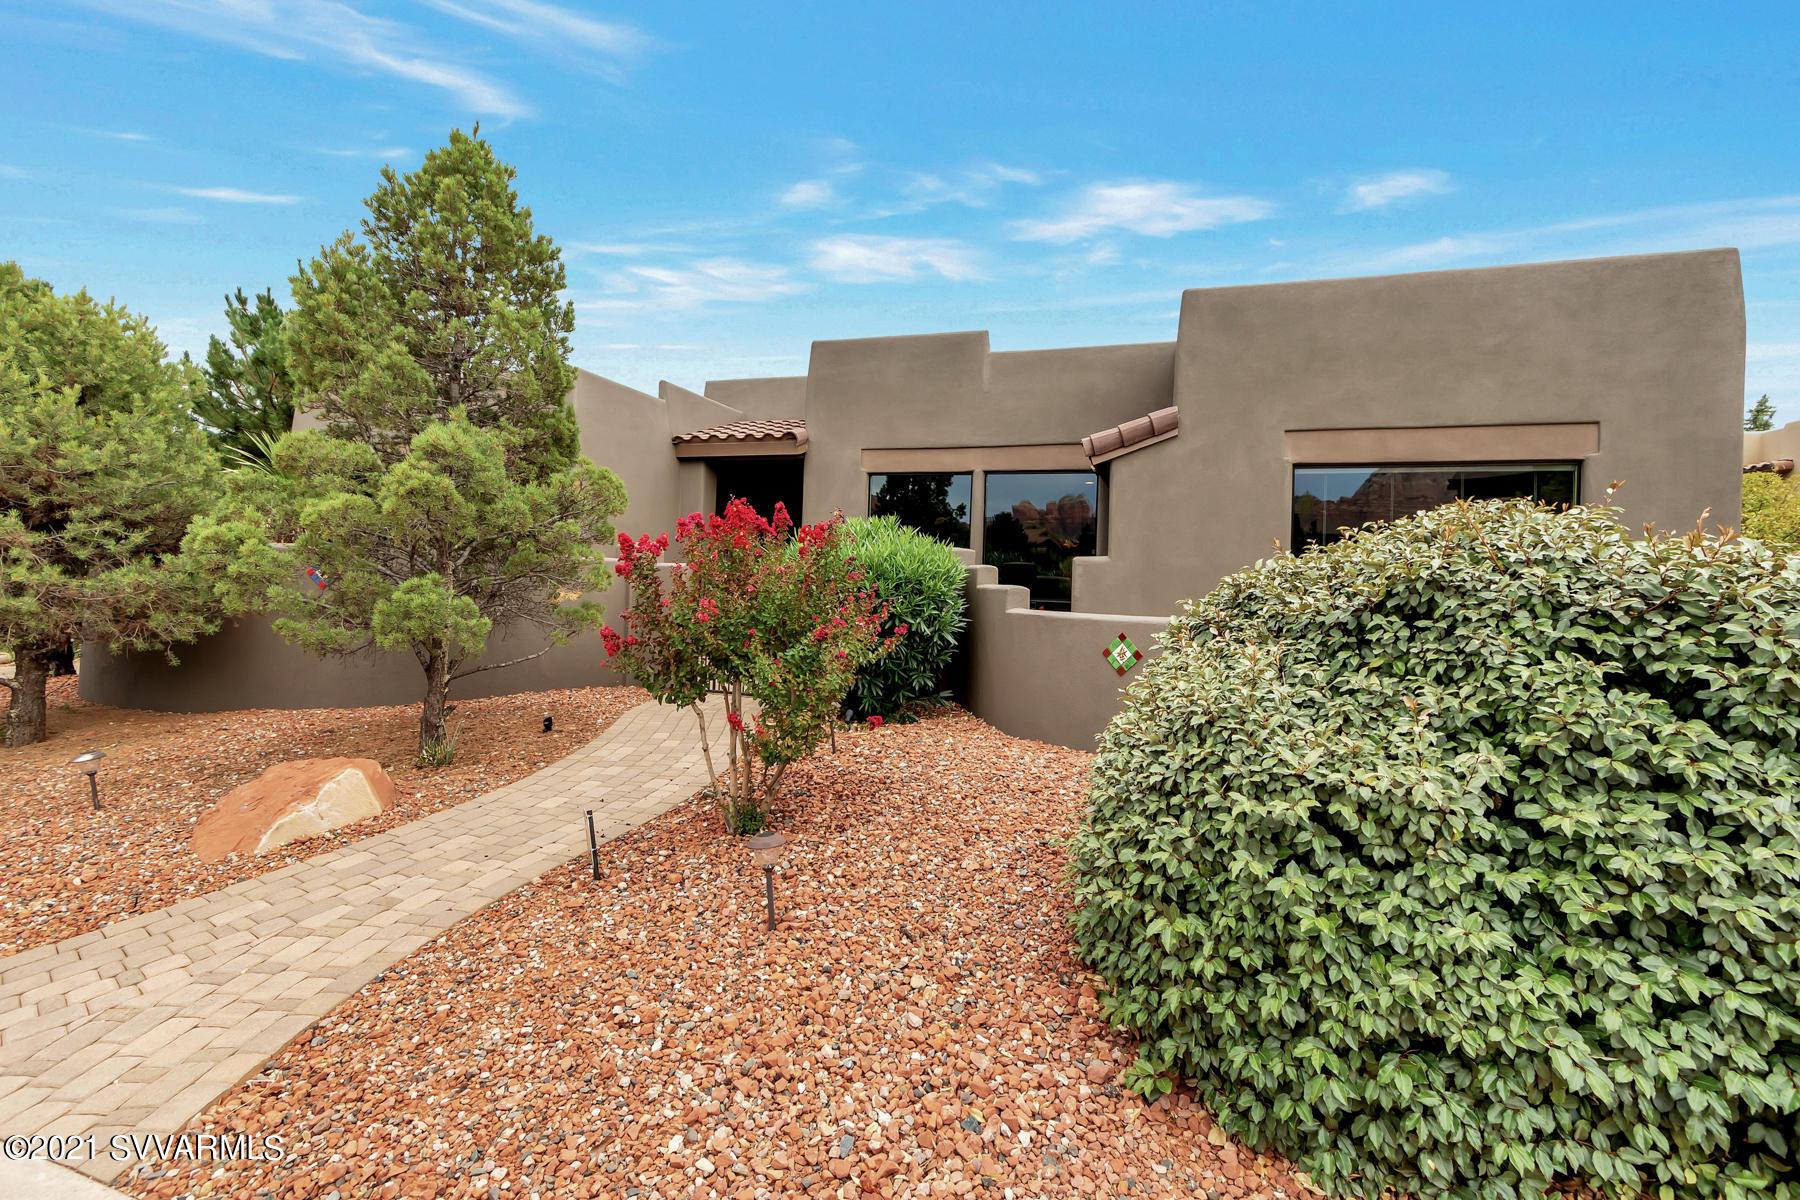 2025 Whippet Way Sedona, AZ 86336